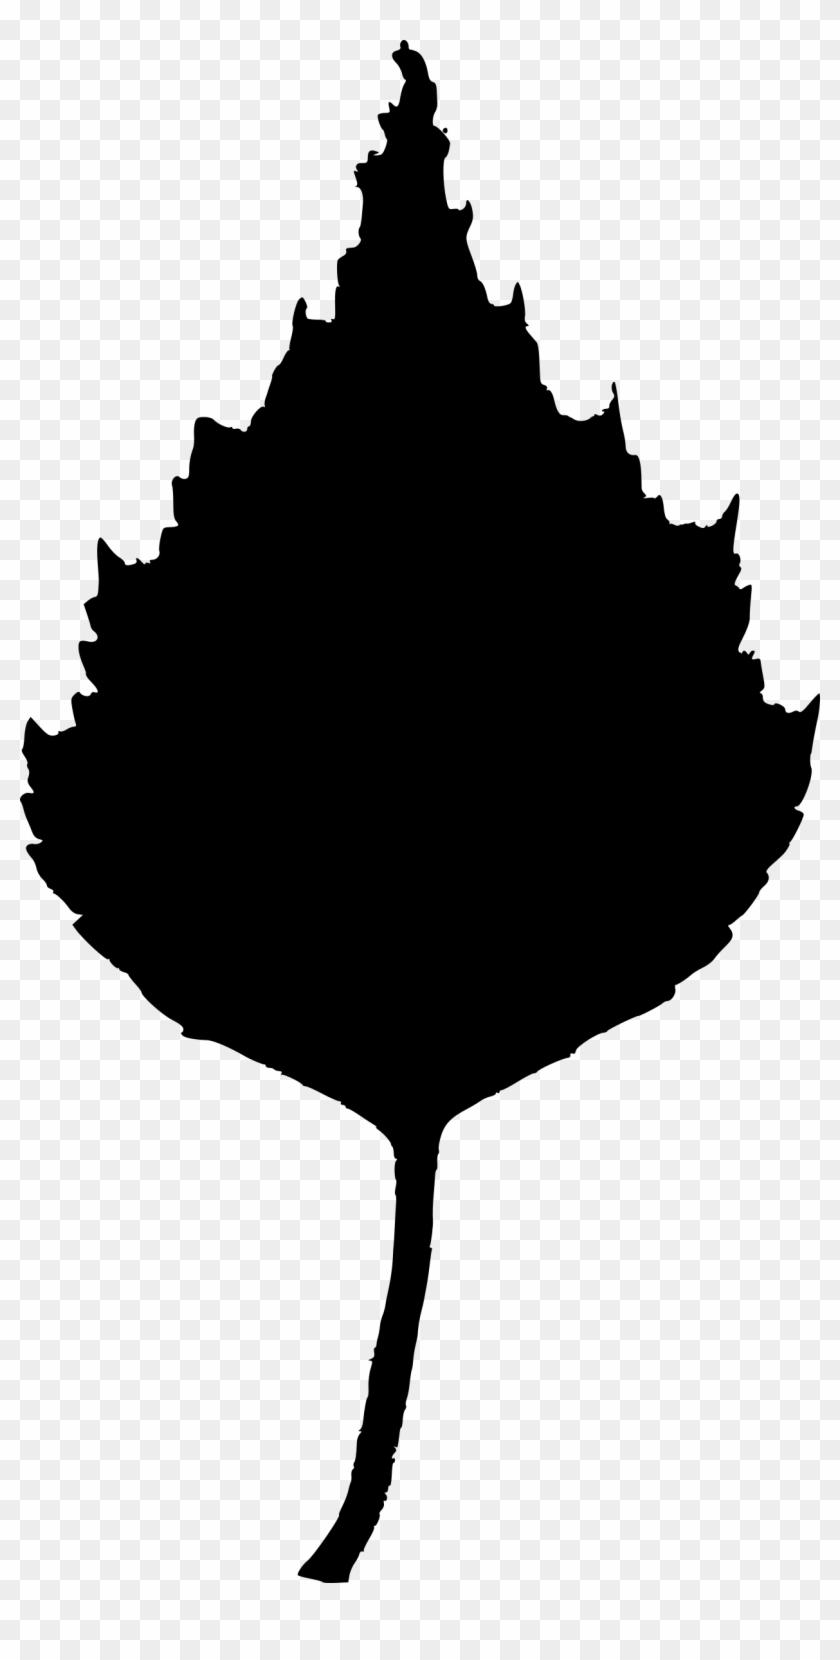 maple leaf clipart birch leaf clip art free transparent png rh clipartmax com birch tree background clipart Birch Tree Trunk Clip Art